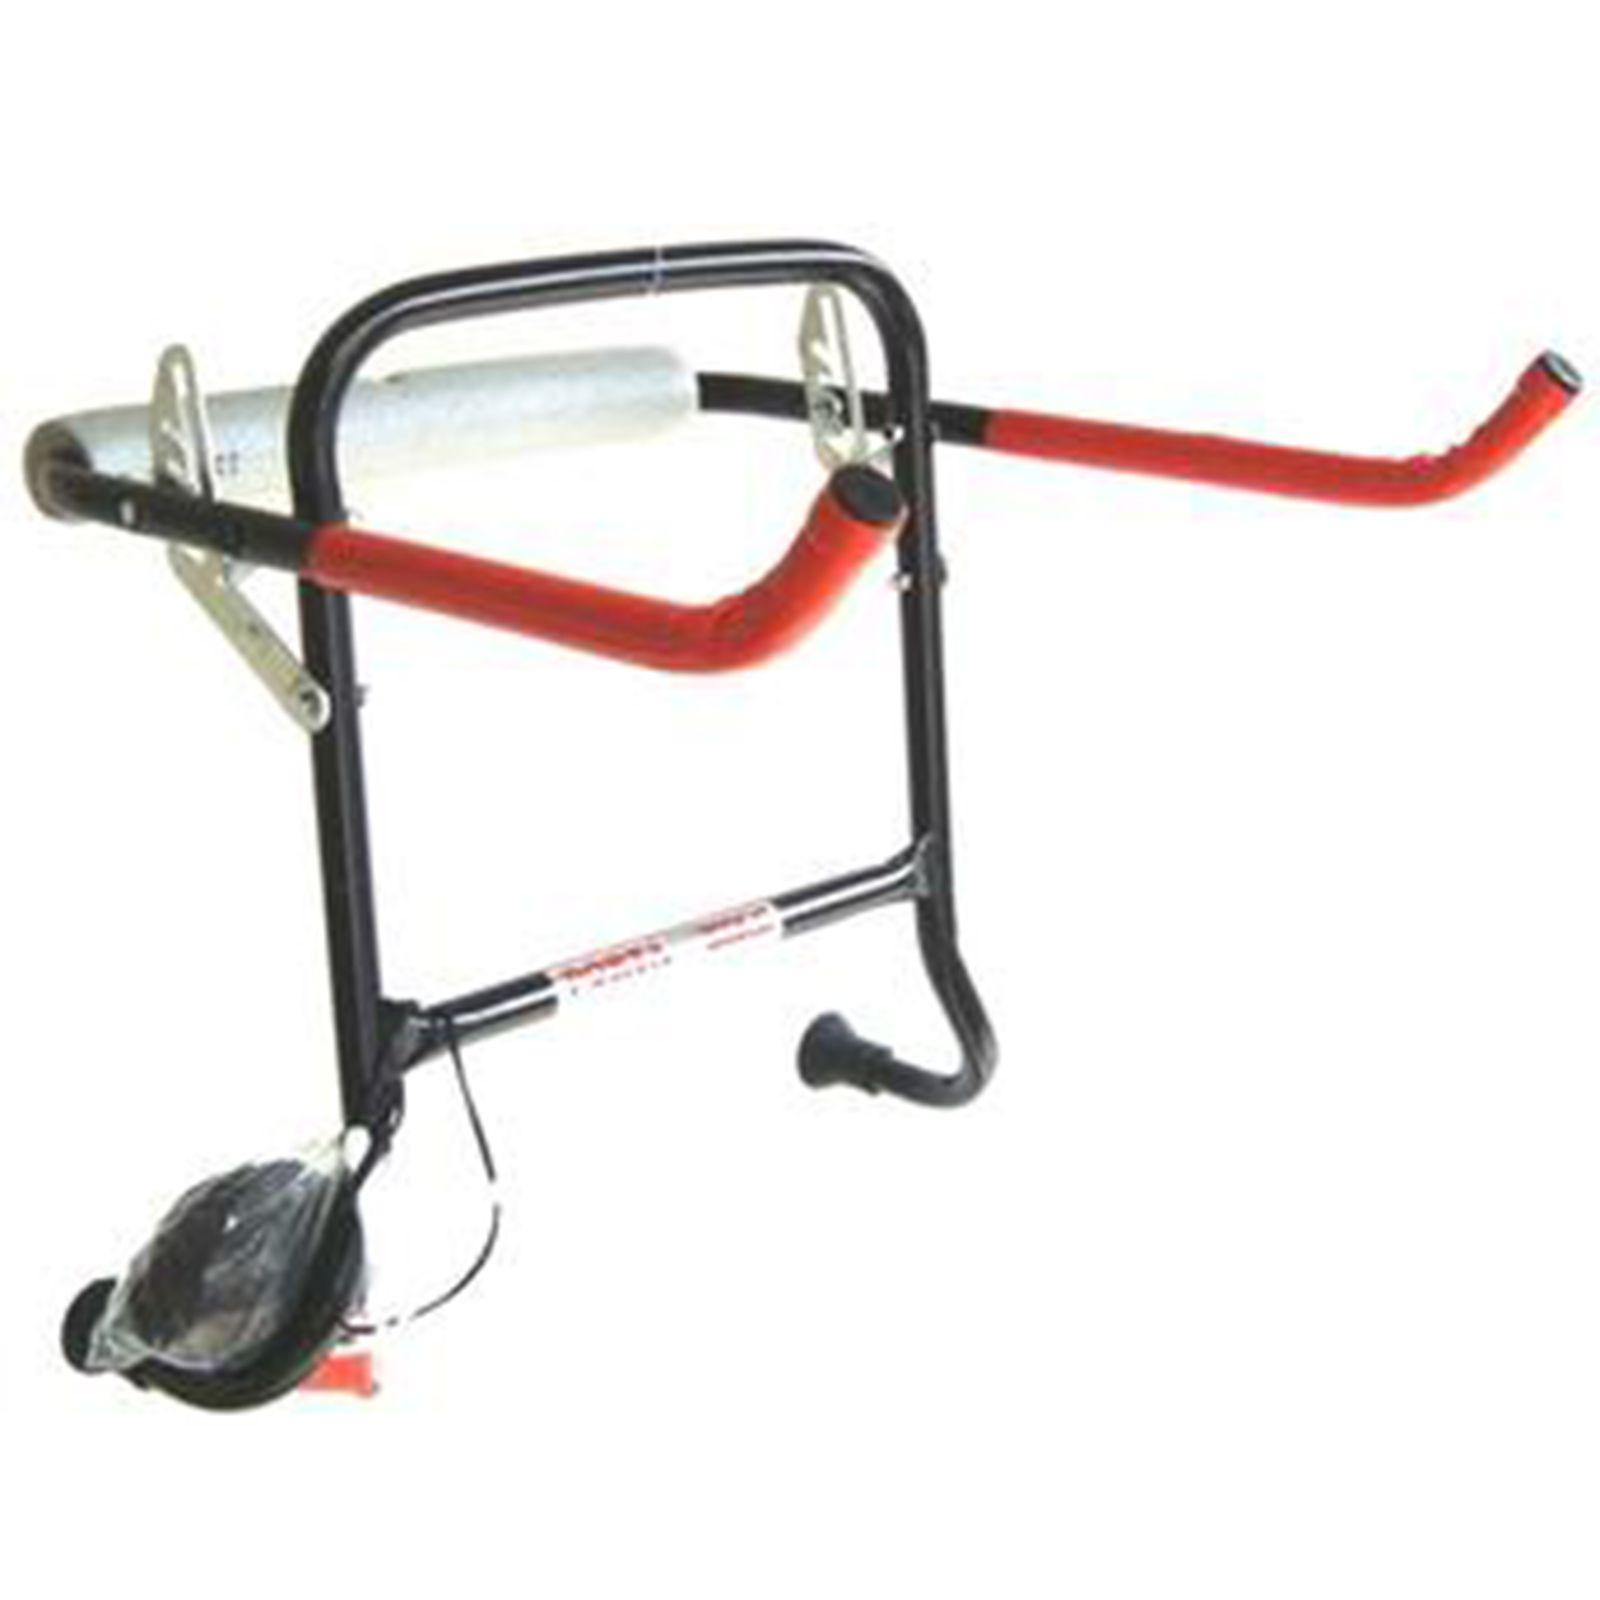 Suporte Transbike para 2 bikes - Bagageiro